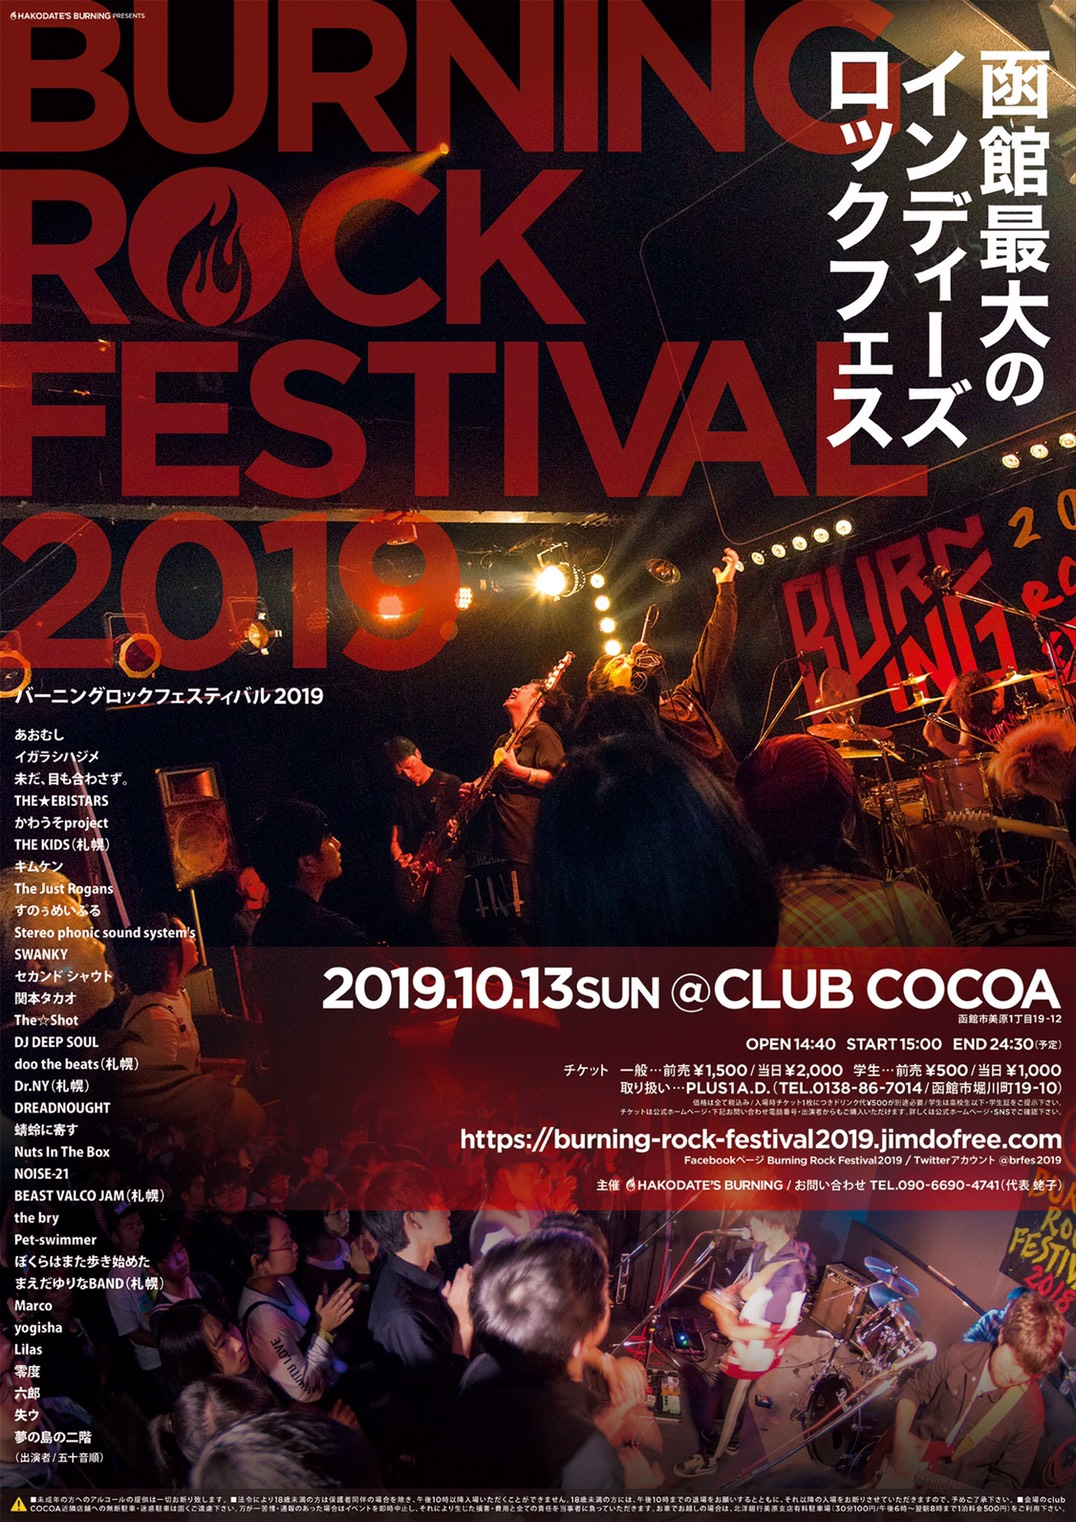 BURNING ROCK FESTIVAL 2019 (Band Live) @ 函館 Club COCOA